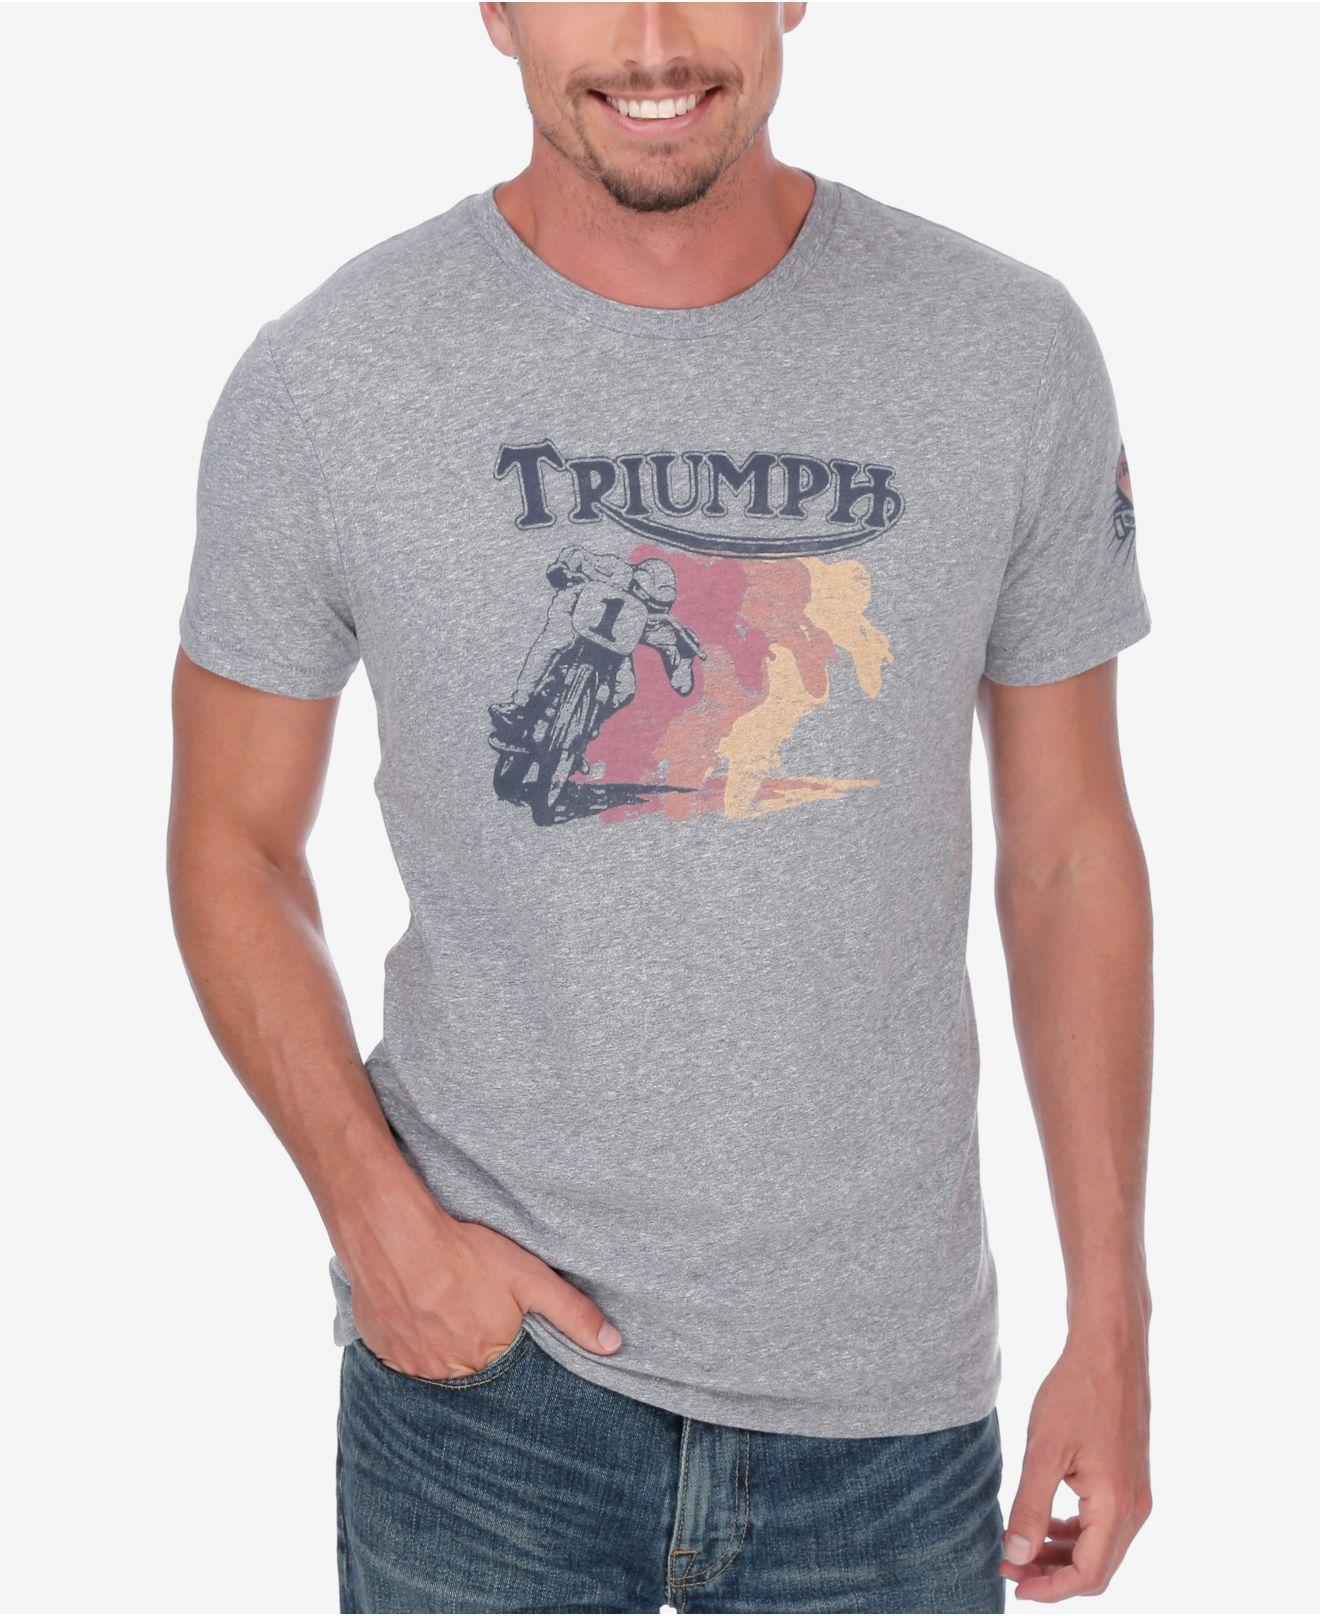 4255549d2 Lucky Brand Men's Retro Triumph T-shirt in Gray for Men - Lyst